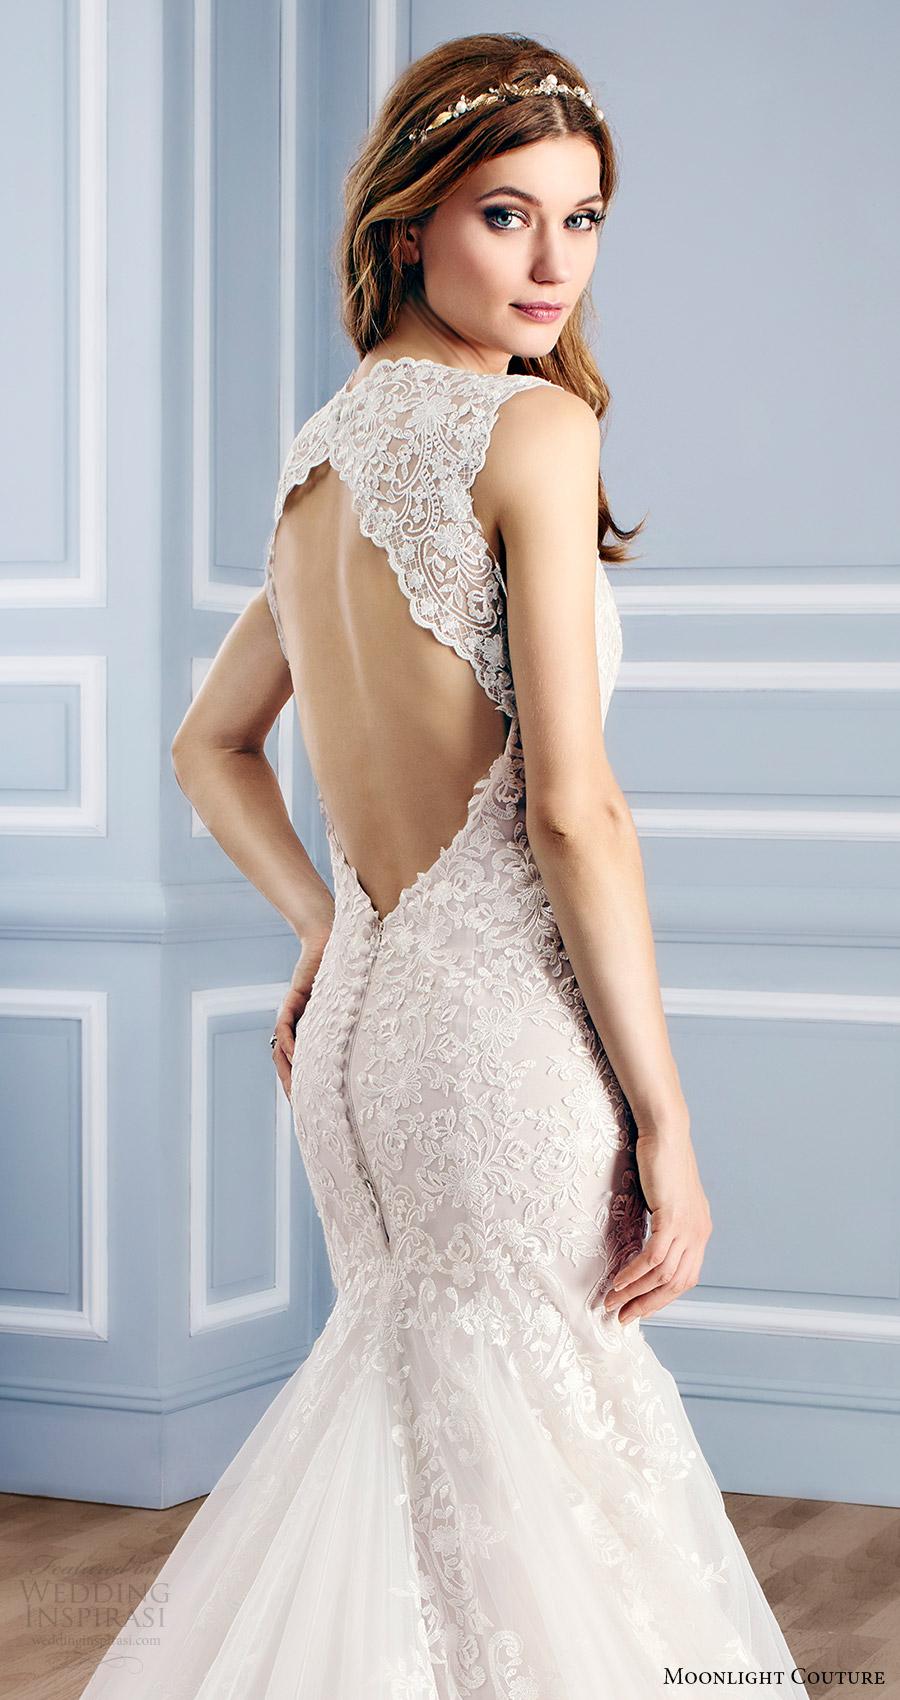 moonlight couture bridal fall 2016 sleeveless vneck lace mermaid wedding dress (h1312) zbv keyhole back train